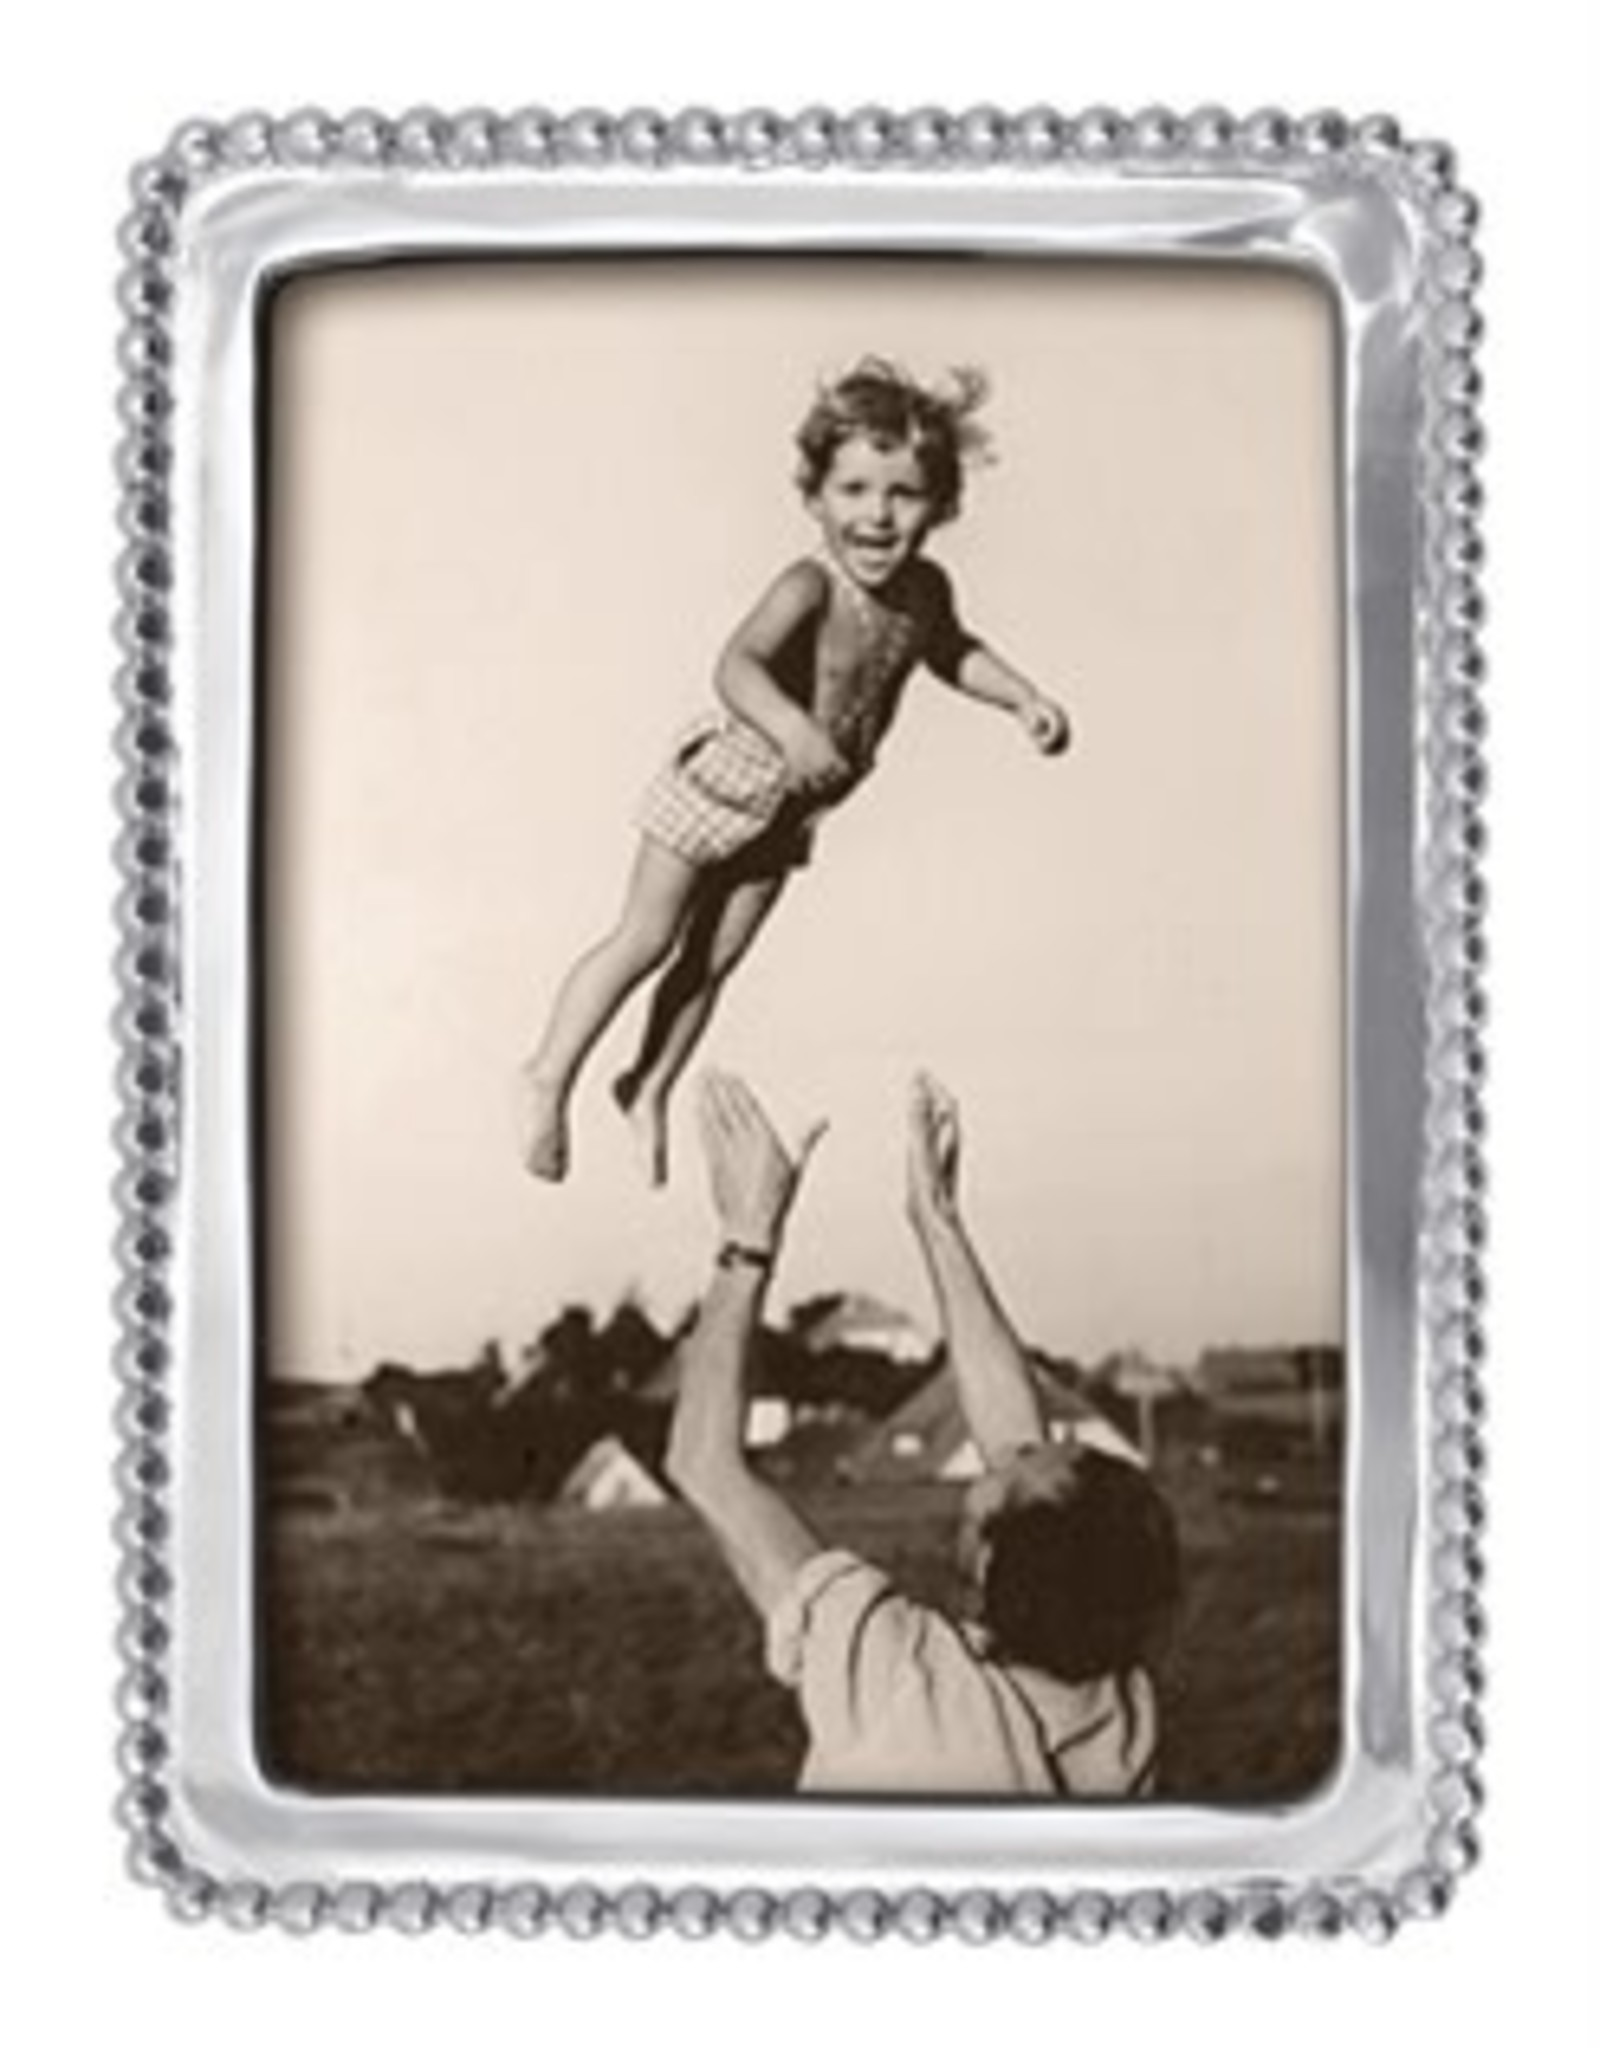 Mariposa Beaded Frames by Mariposa